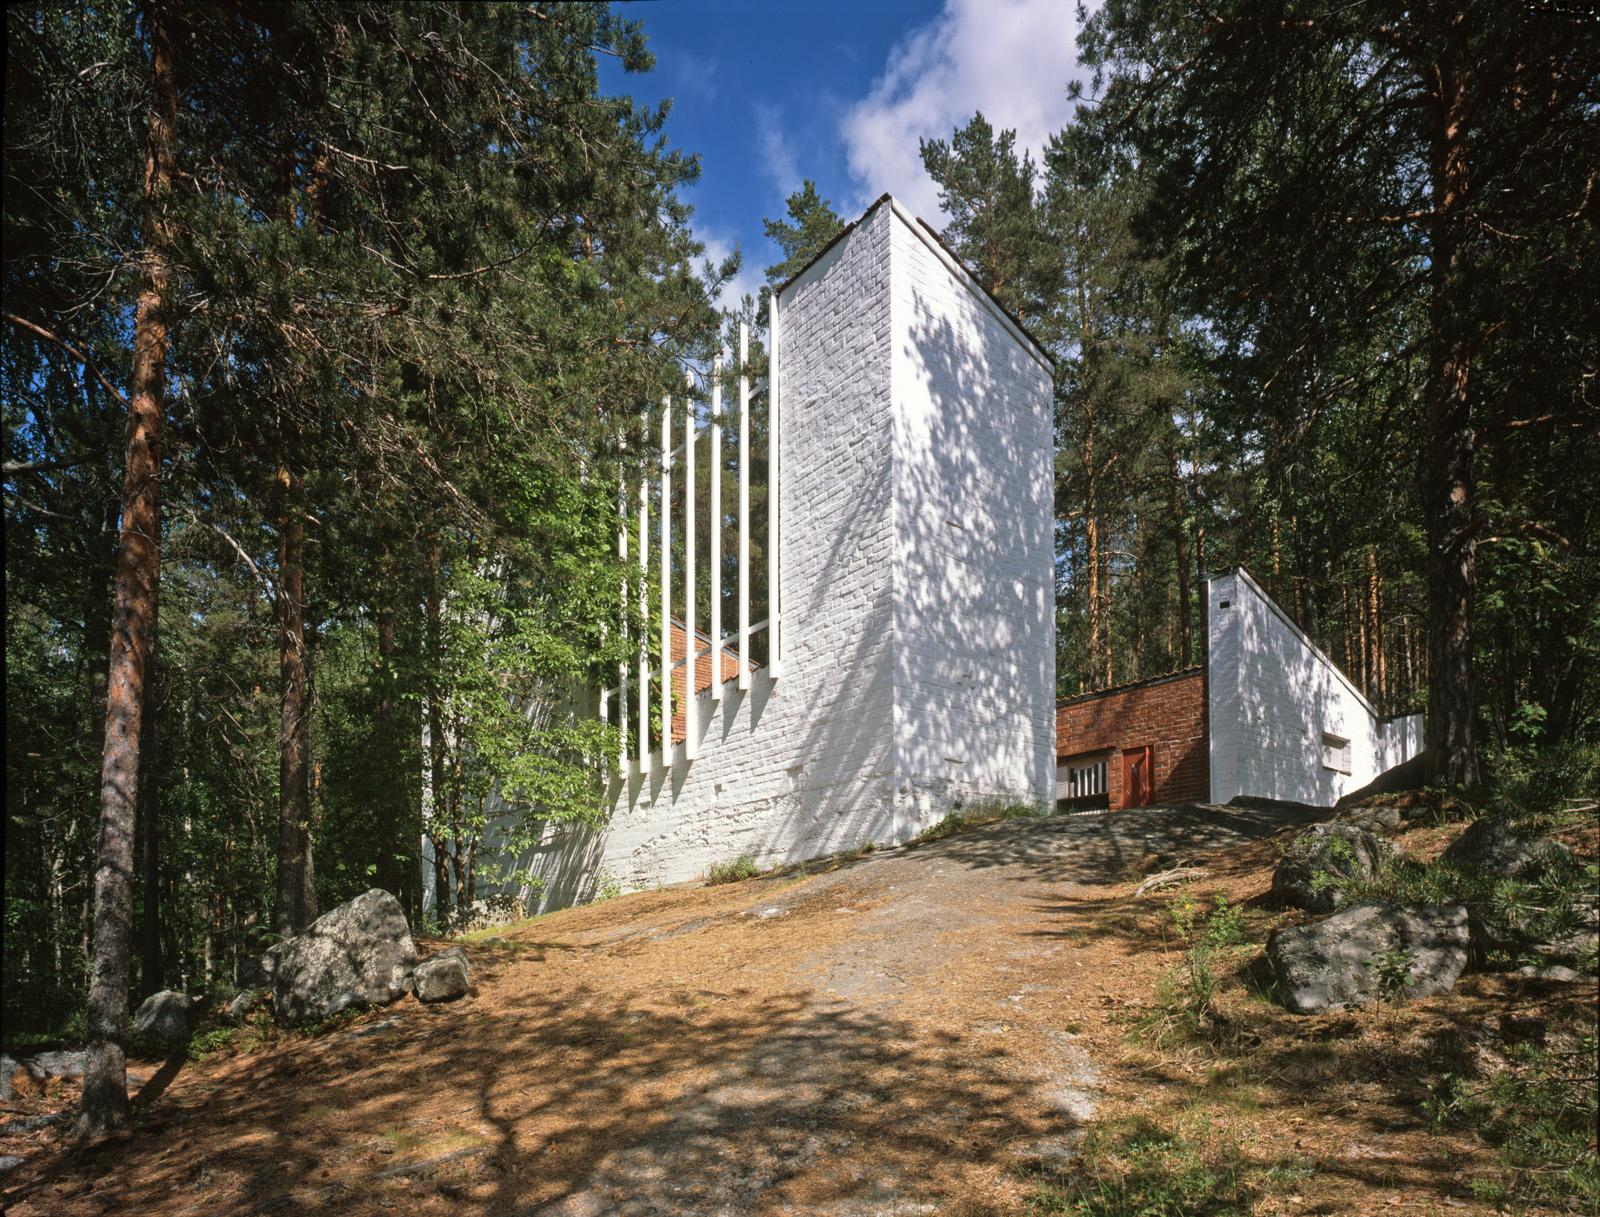 Muuratsalo Experimental House 183 Finnish Architecture Navigator